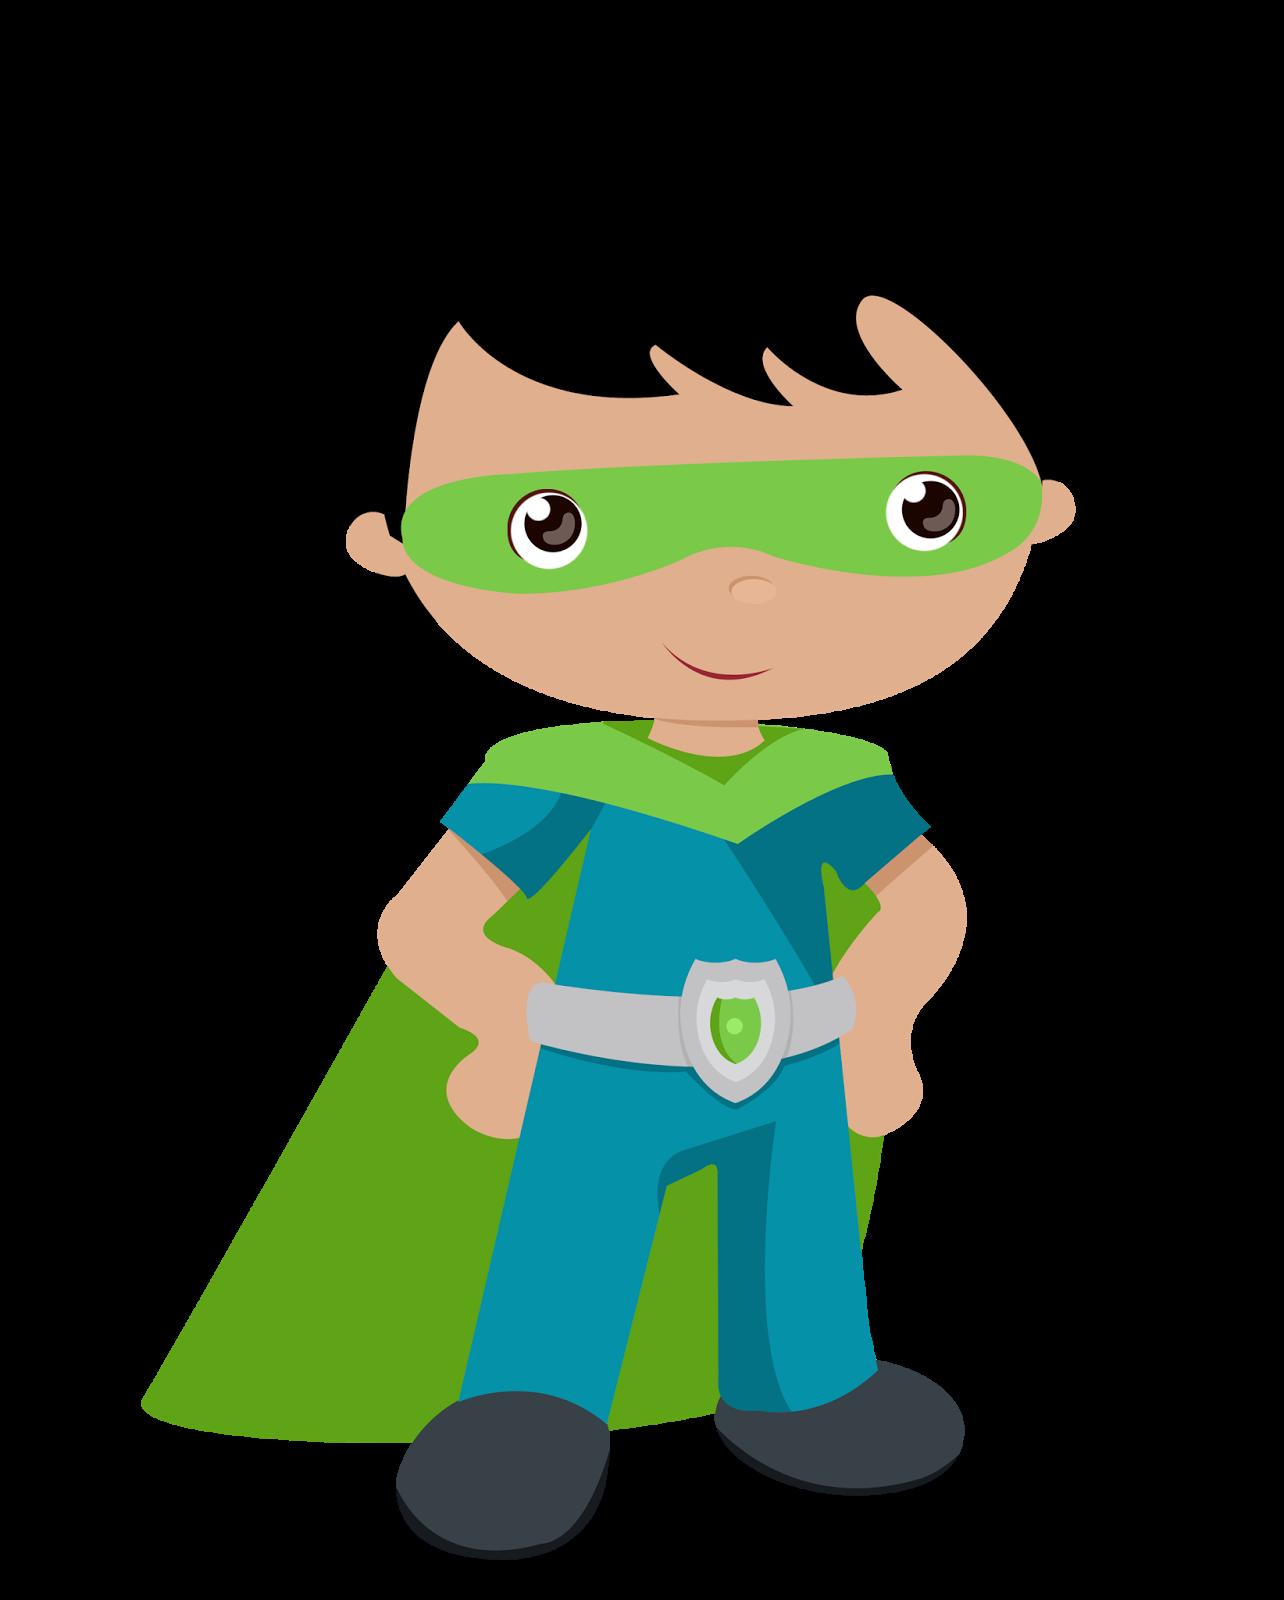 vector transparent library Superhero kid clipart. Superheroes boy frames illustrations